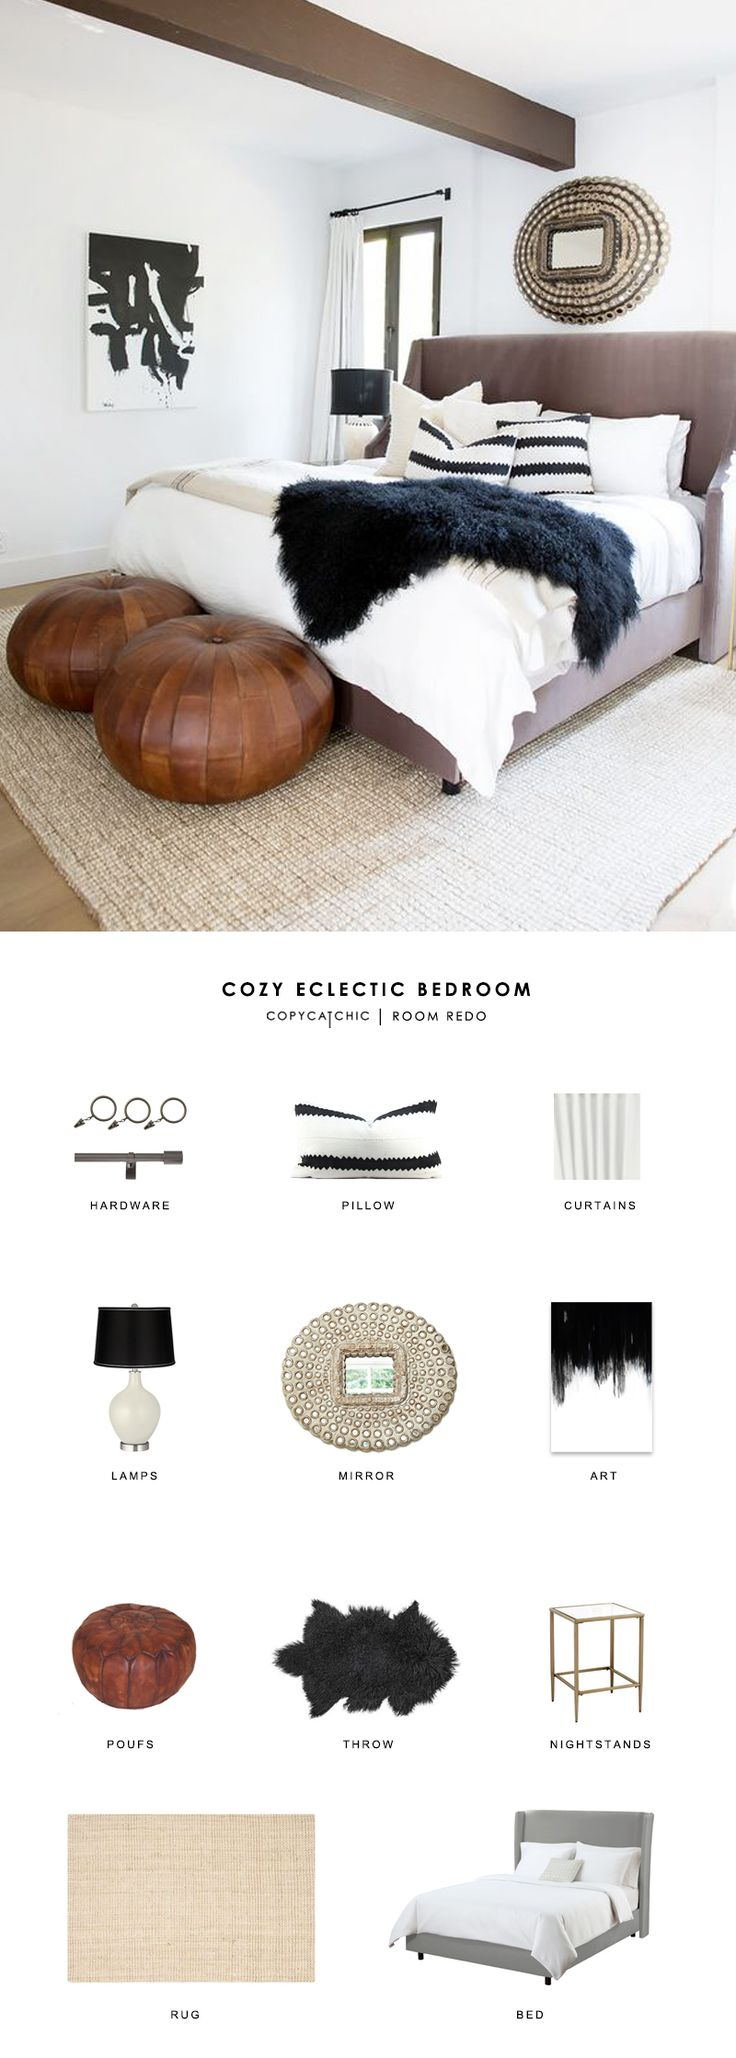 Copy Cat Chic Room Redo | Cozy Eclectic Bedroom | Copy Cat Chic | Bloglovin'